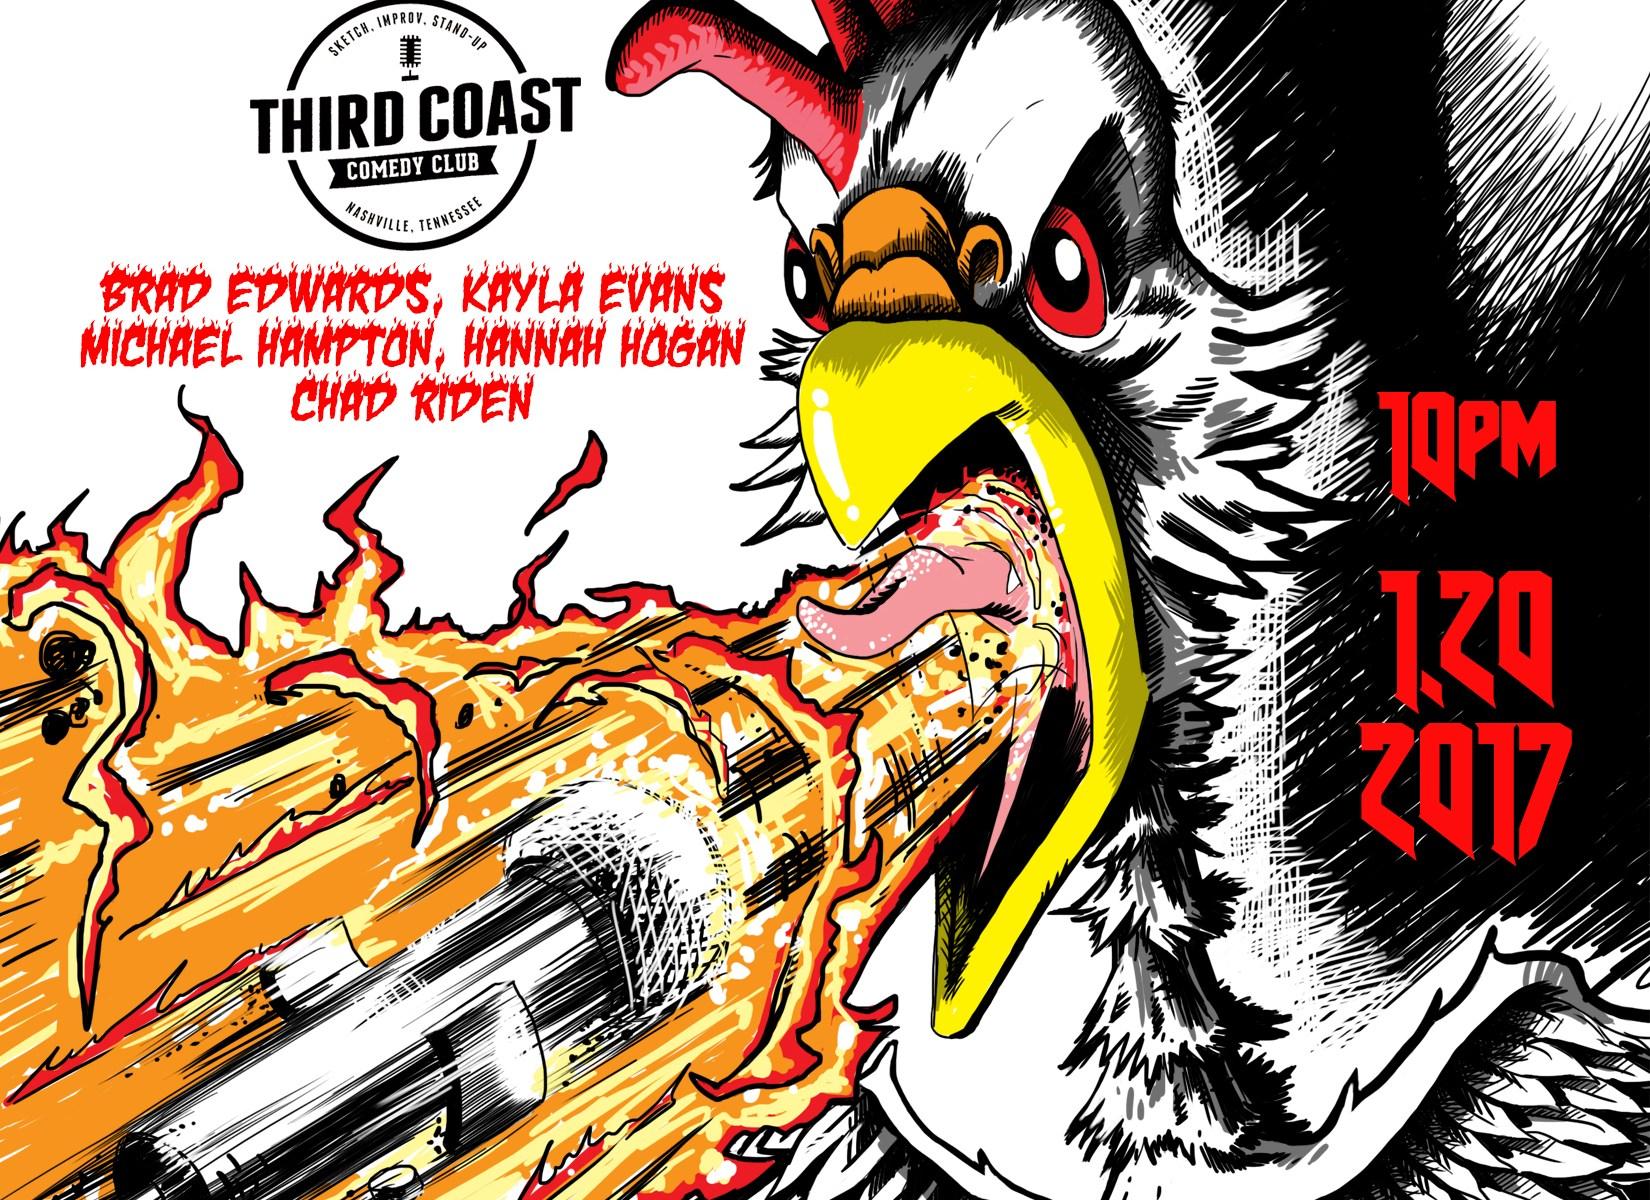 Brad Edwards, Kayla Evans, Michael Hampton, Hannah Hogan, Chad Riden eat hot chicken then tell jokes at Comedy Cataclysm at Third Coast 1/20/2017